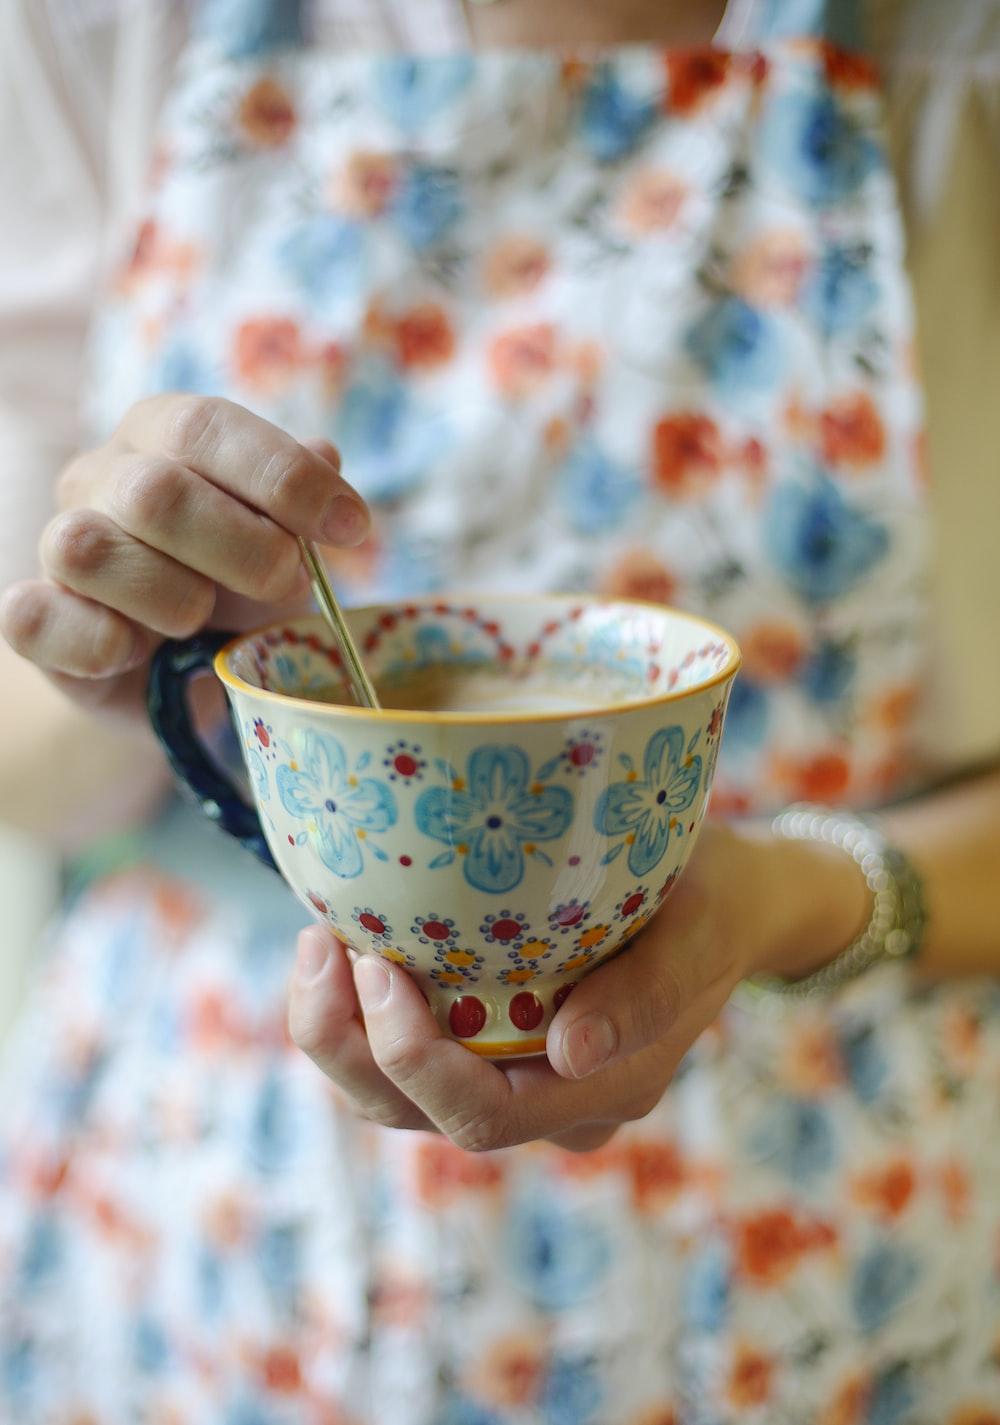 person holding multicolored ceramic teacup